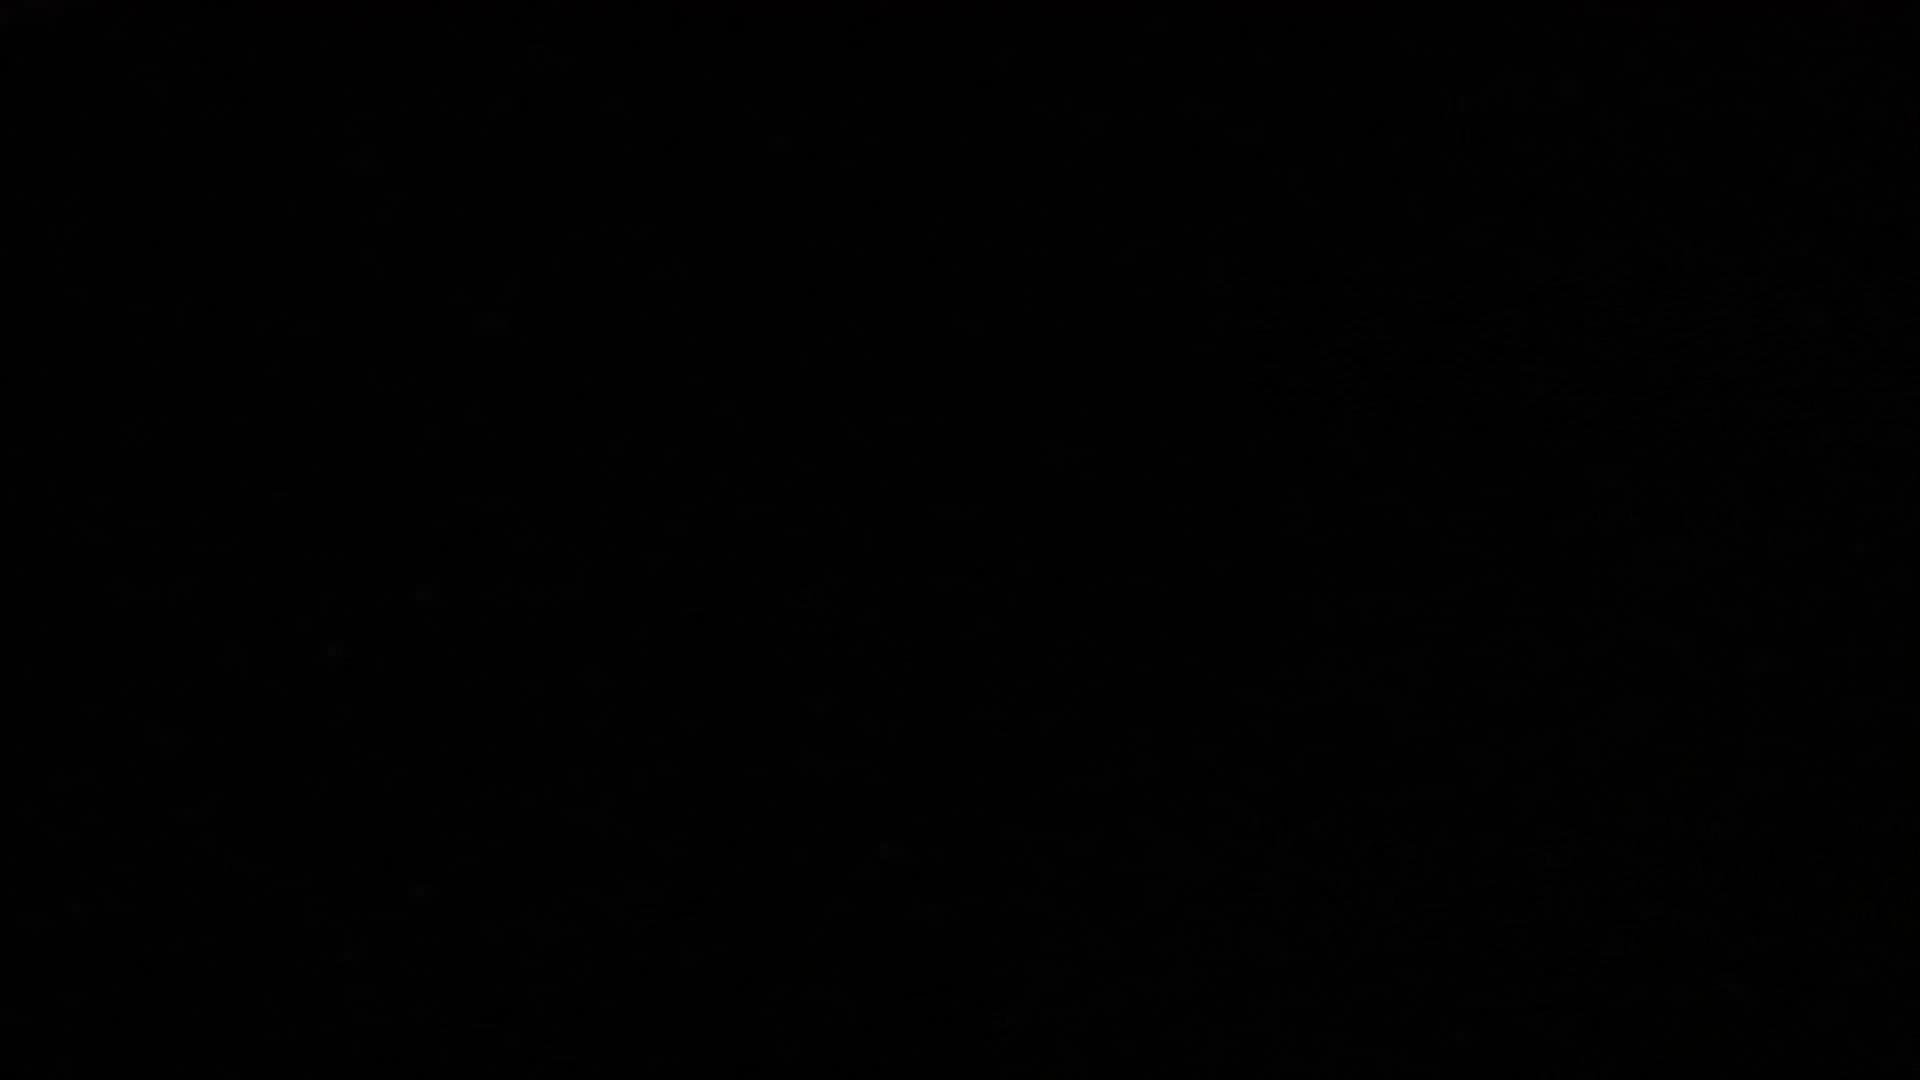 SPYさん初投稿!マンション覗き!5000K!ハイビジョン撮影VOL.05(元サッカー部員社会人) スポーツマン  38pic 30